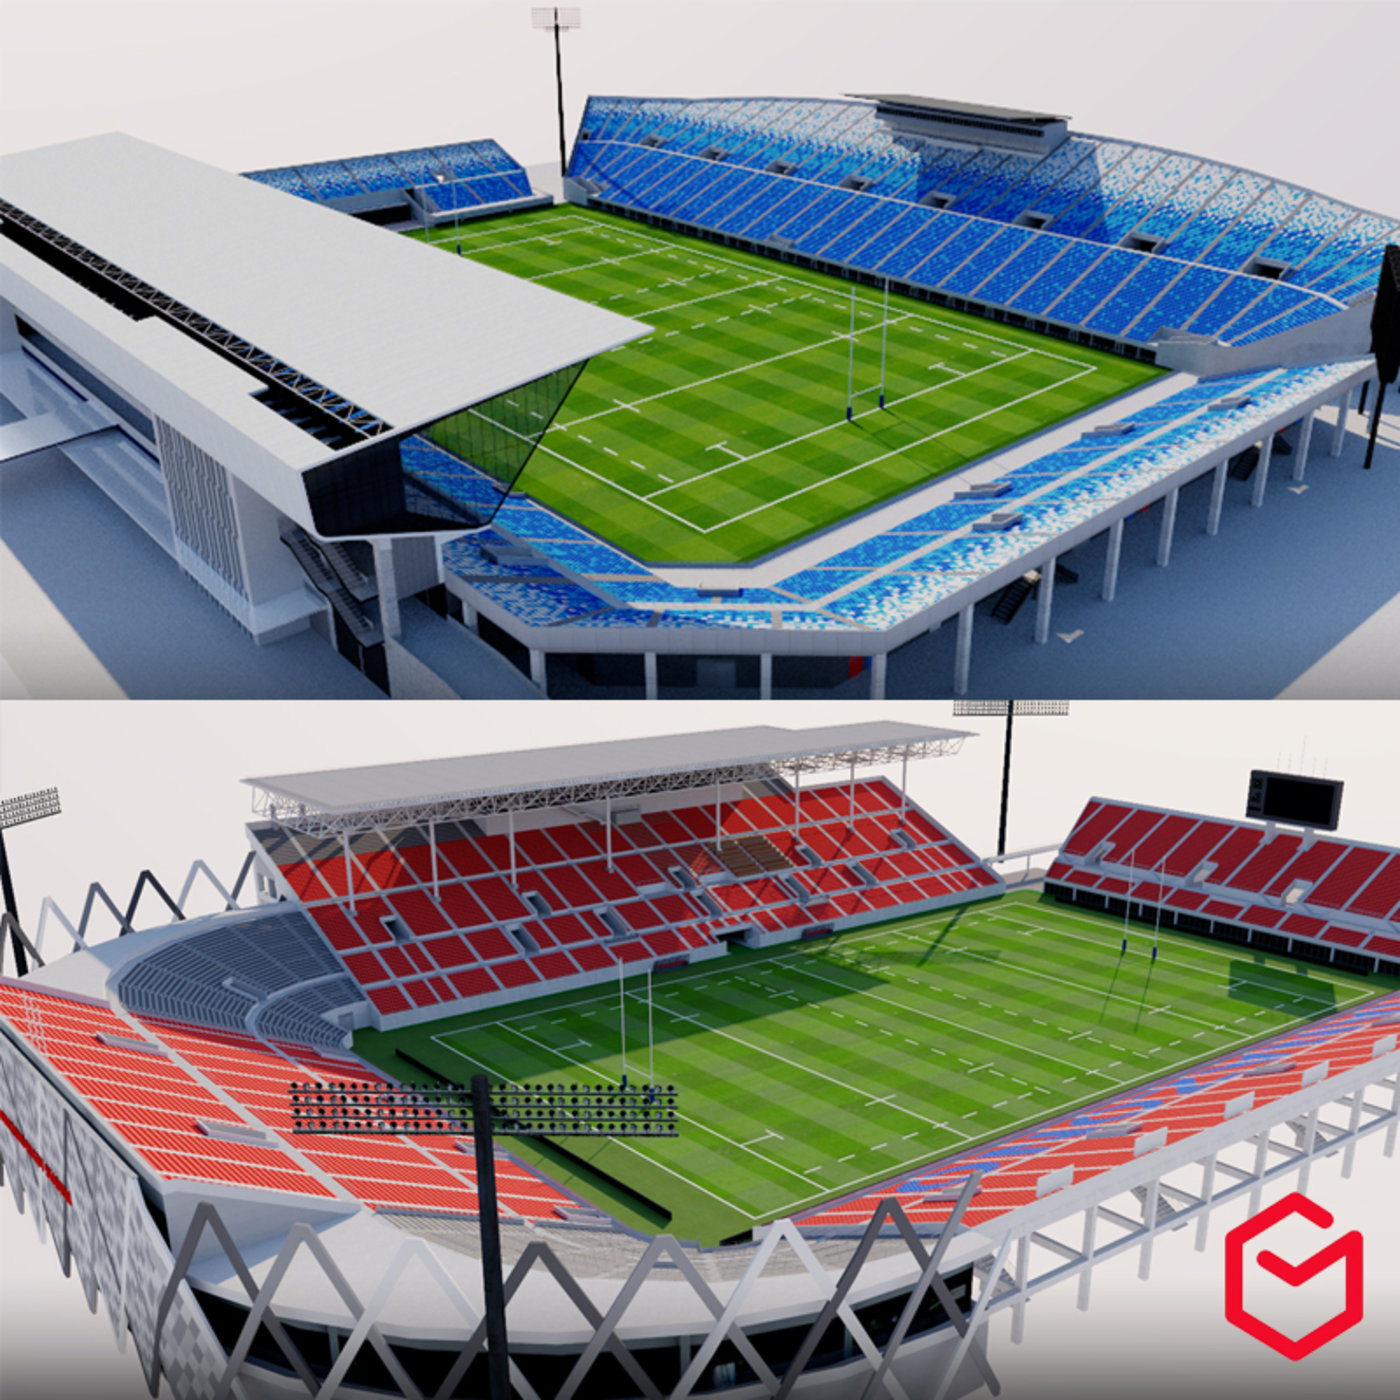 Rugby WC Japan 2019 Venues - Stadiums